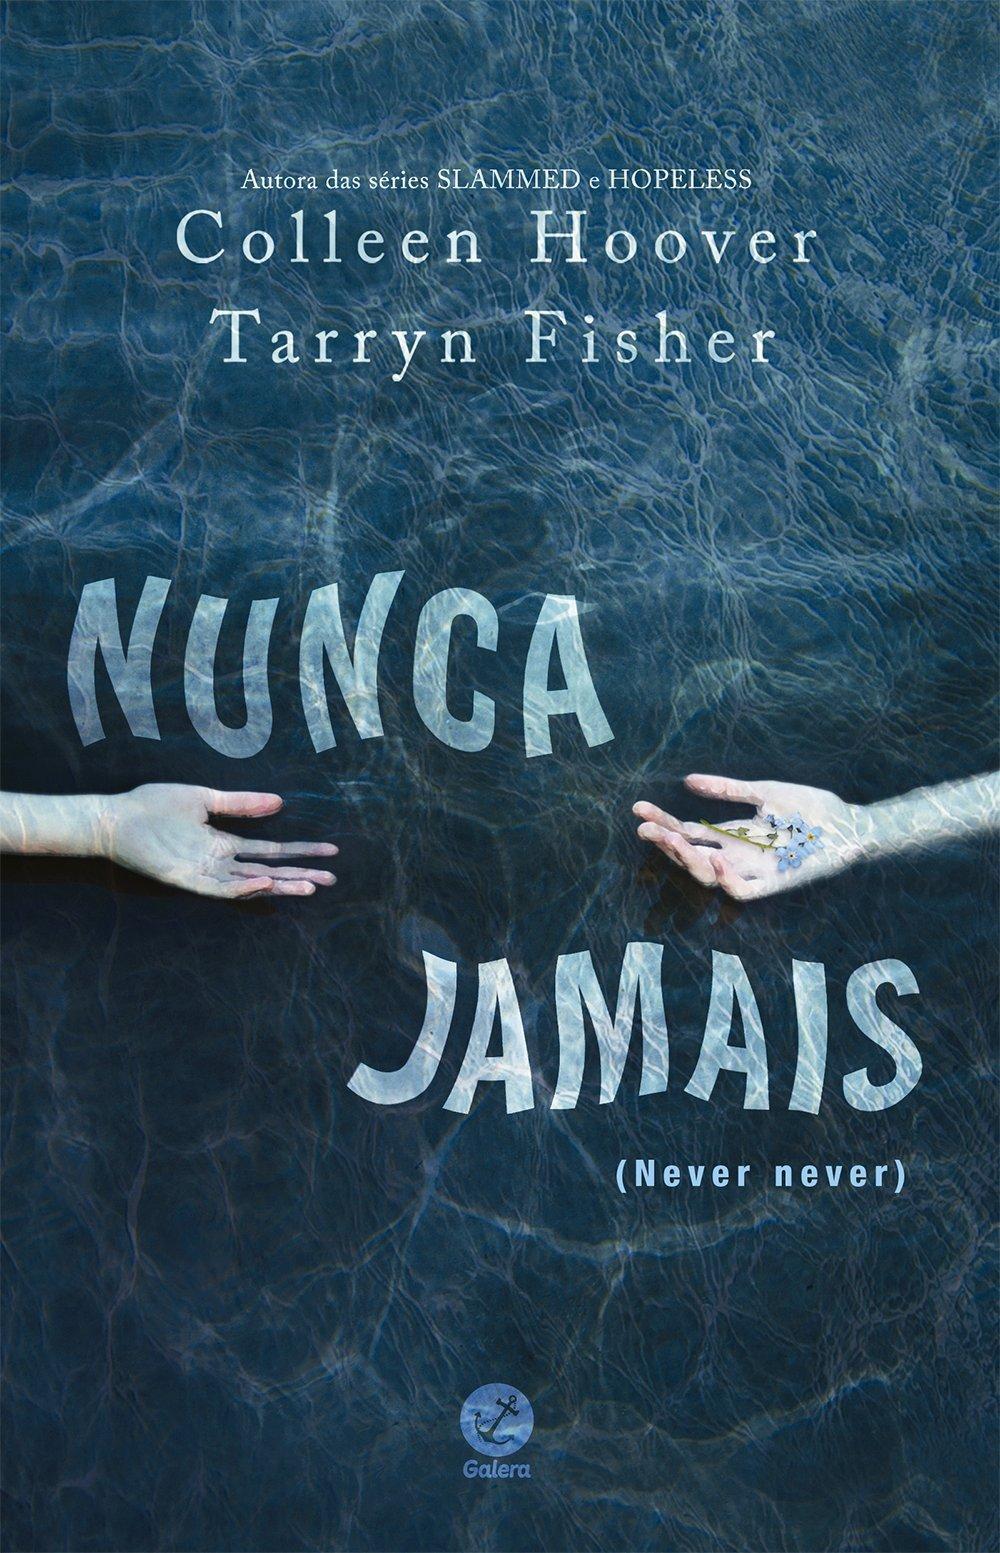 Nunca Jamais, de Colleen Hoover e Tarryn Fisher